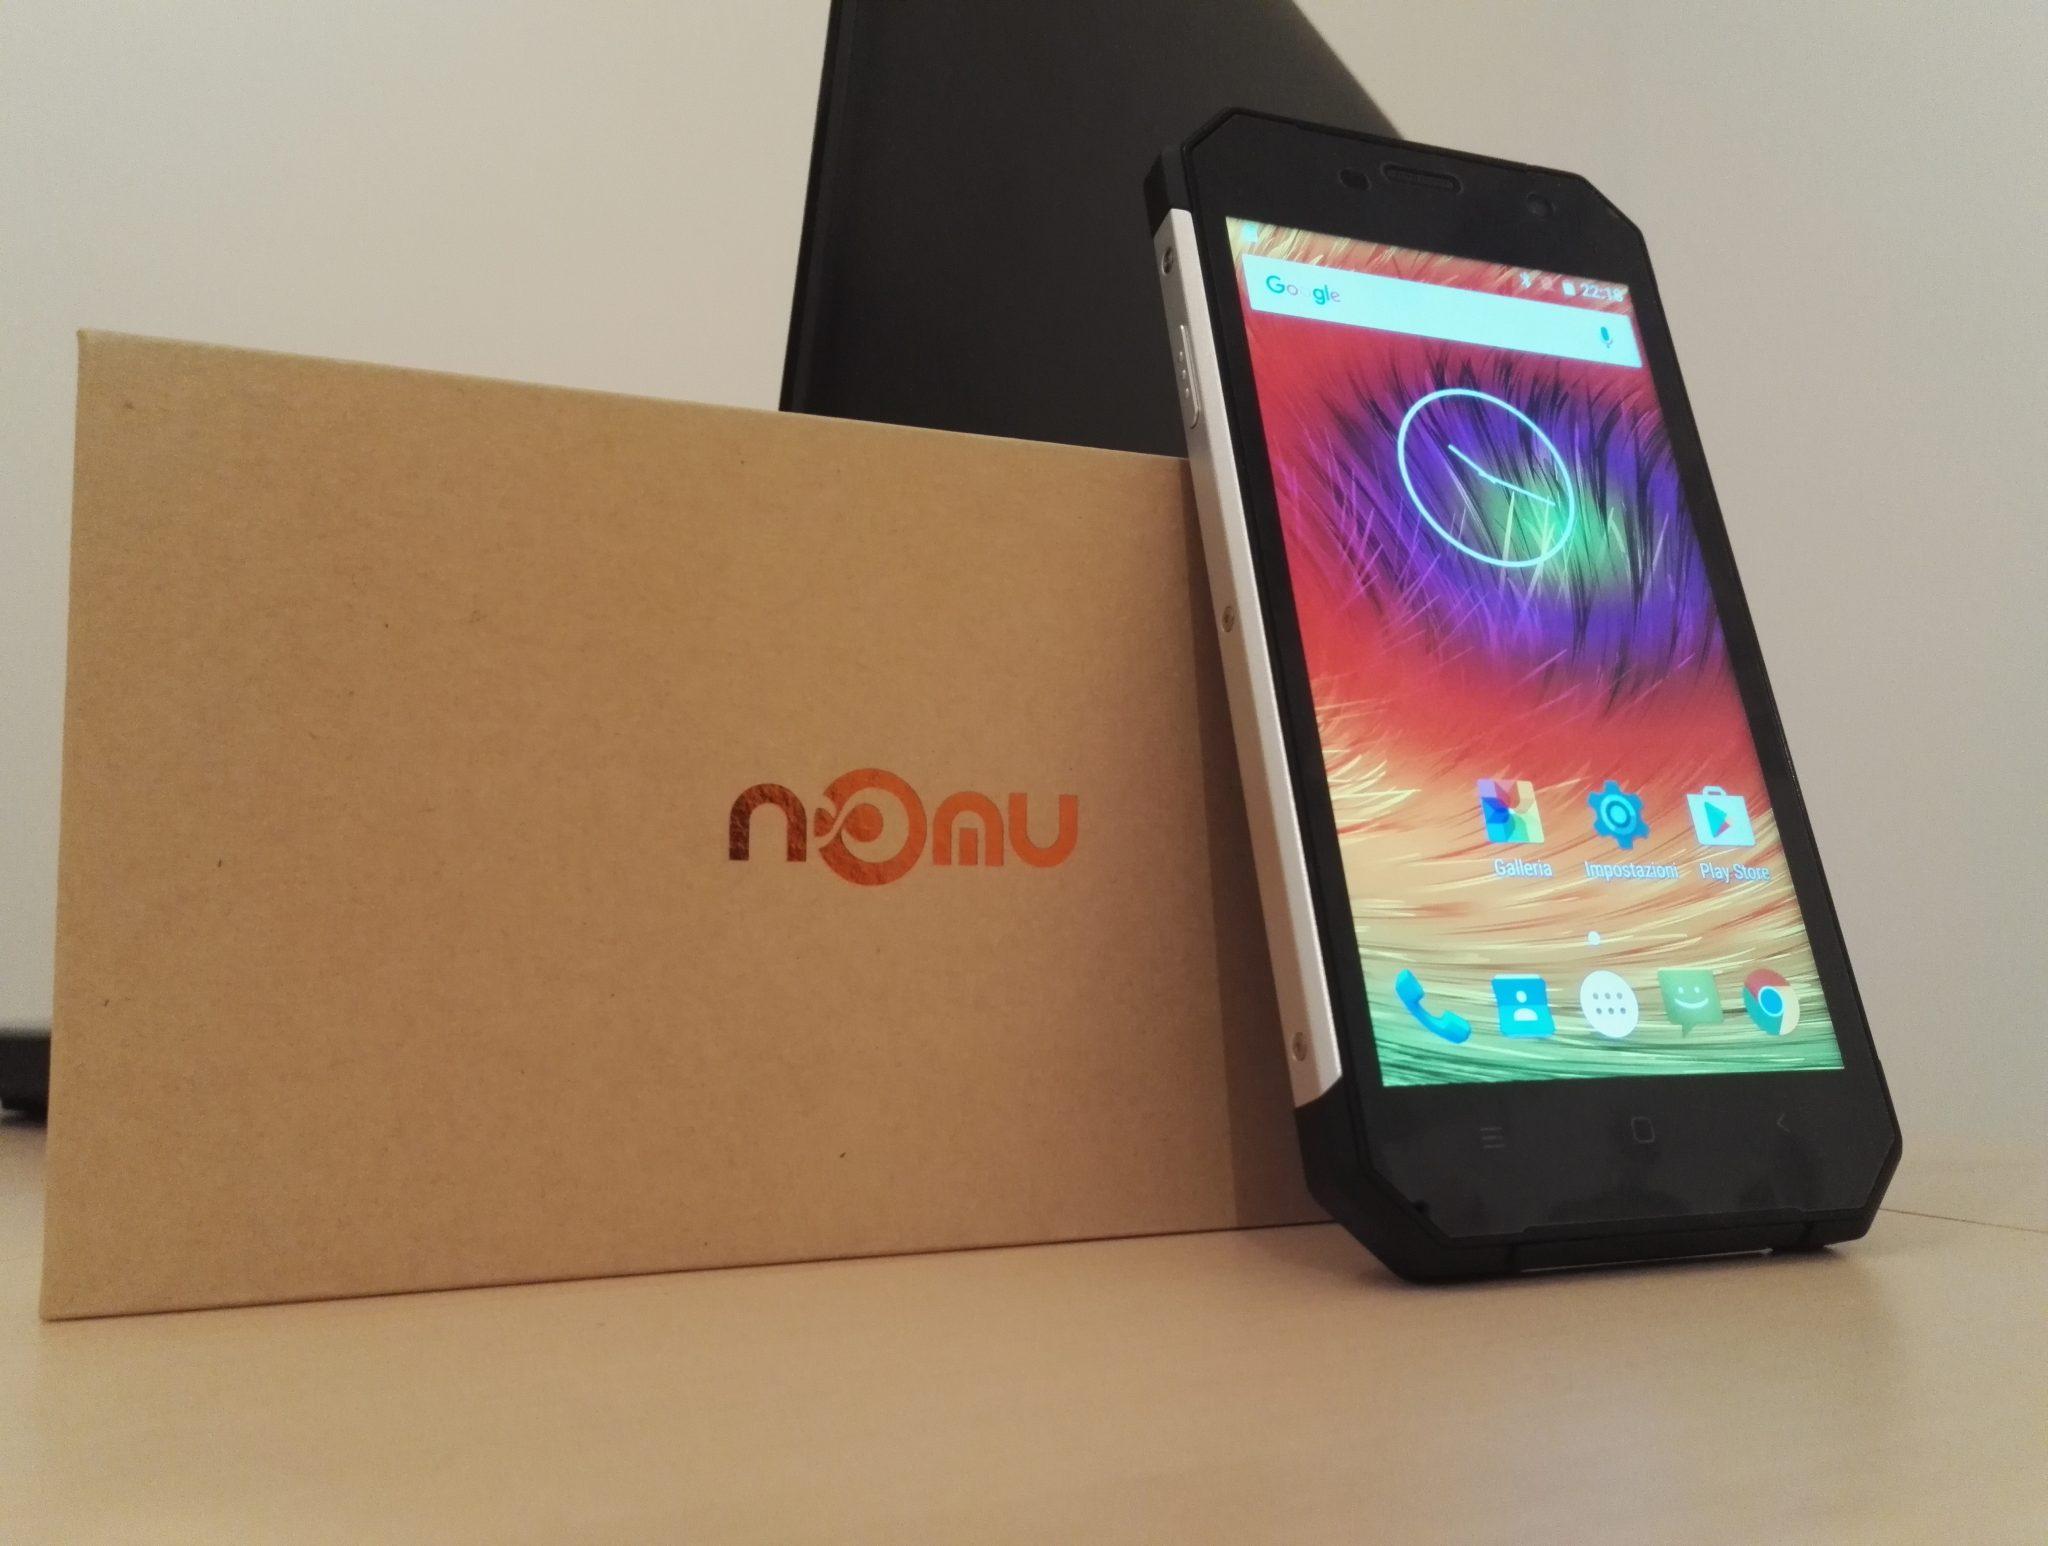 Smartphone resistente Nomu S30